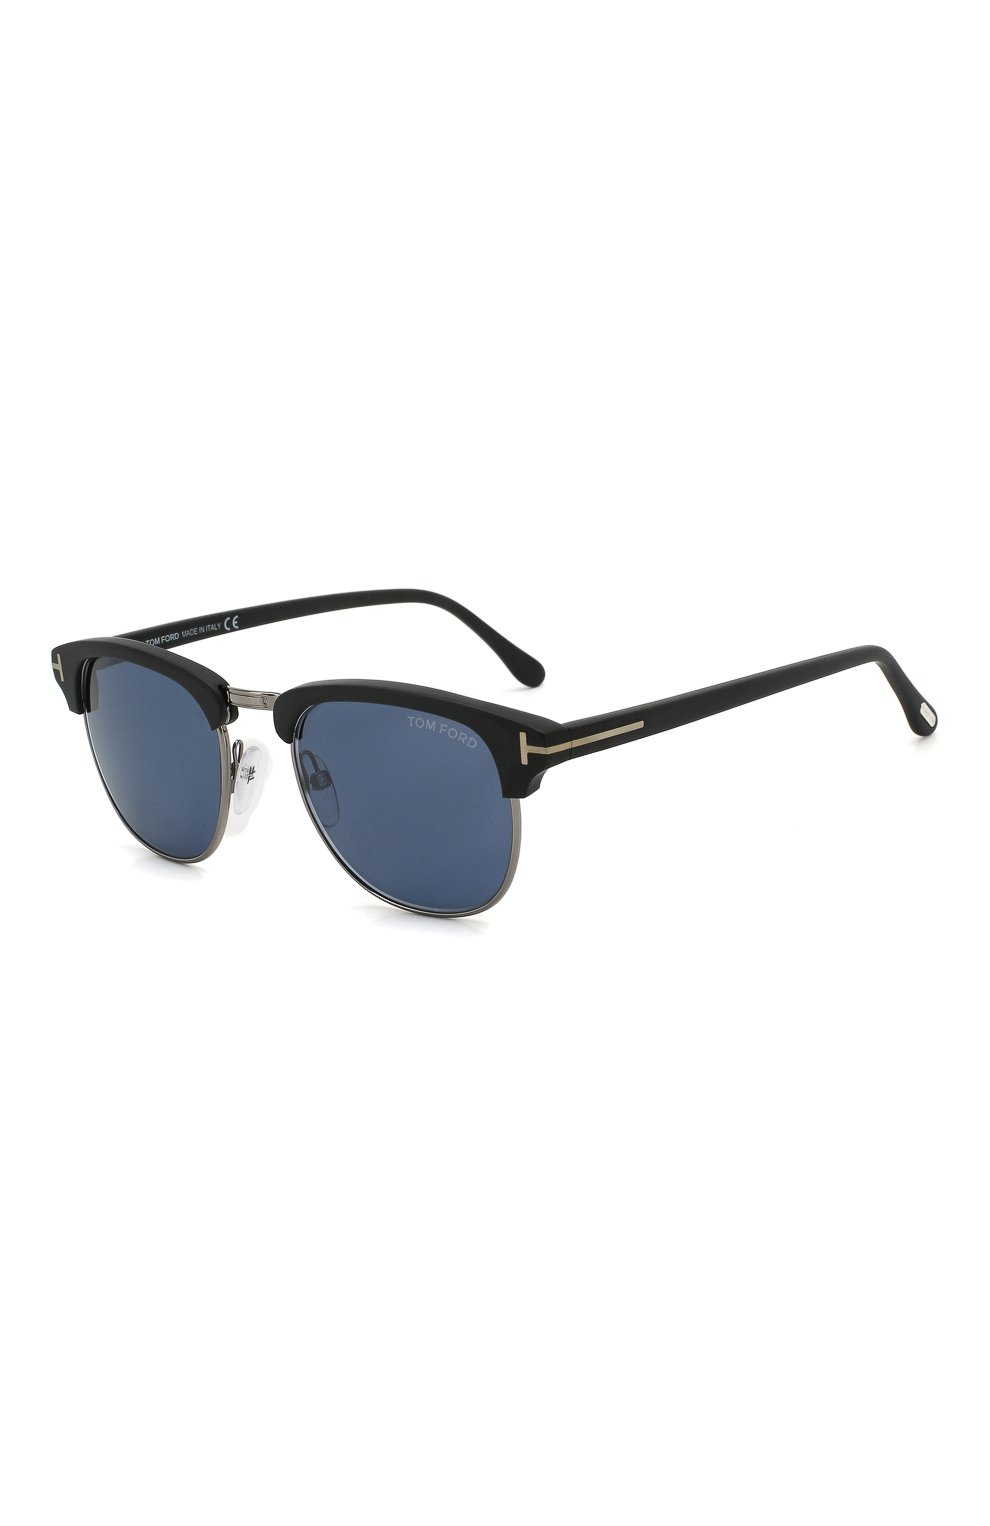 Мужские солнцезащитные очки TOM FORD черного цвета, арт. TF248 02X | Фото 1